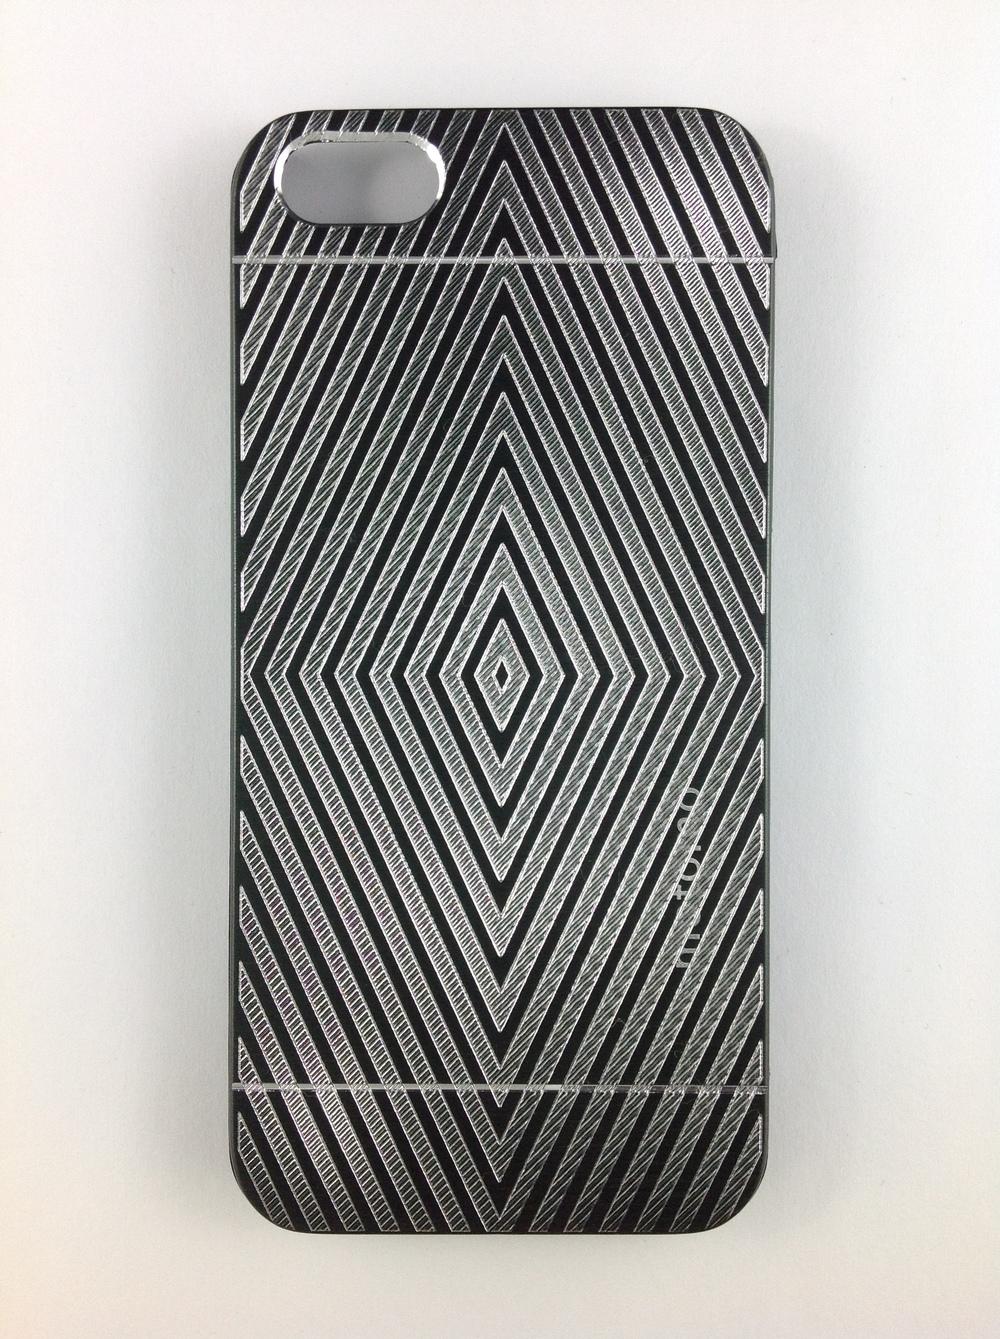 DigitalCarver-iPhone5s-IMG_3687.JPG